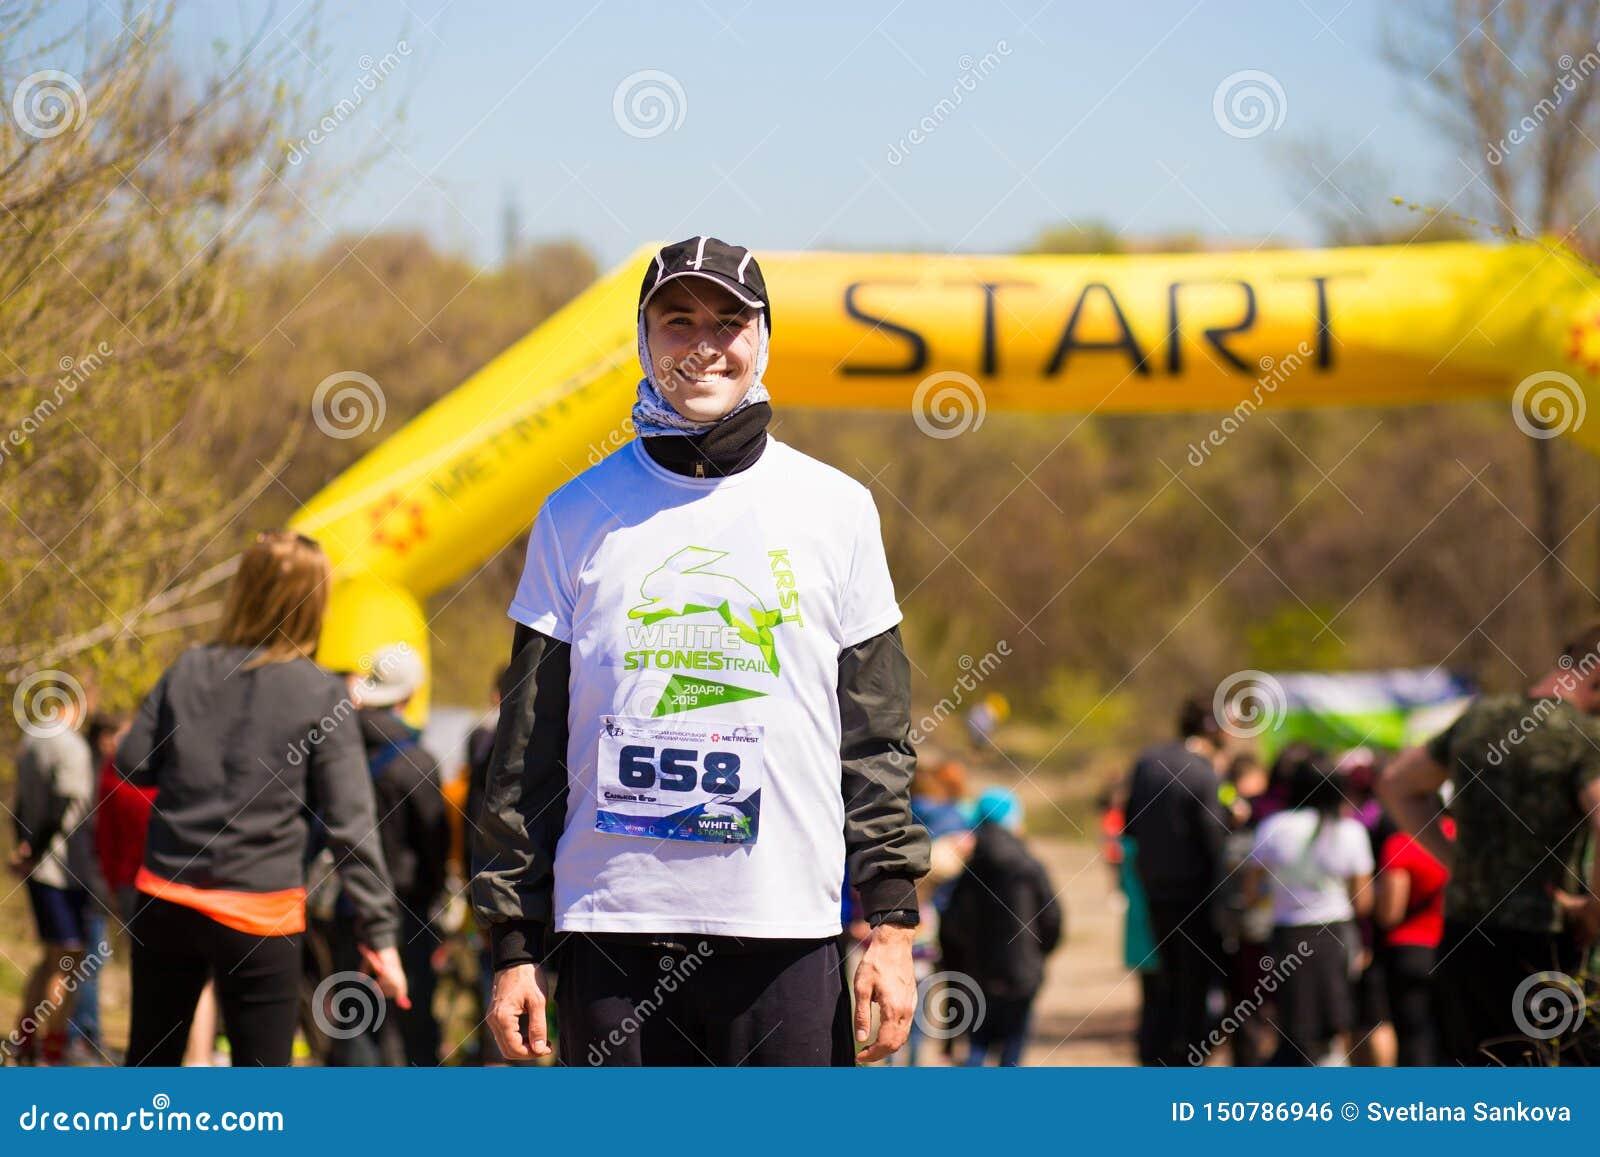 Krivoy Rog, Ουκρανία - 21 Απριλίου 2019: Ομάδα νέων αθλητών στη θέση έναρξης Κατάλληλοι νέοι που προετοιμάζονται για το μαραθώνιο